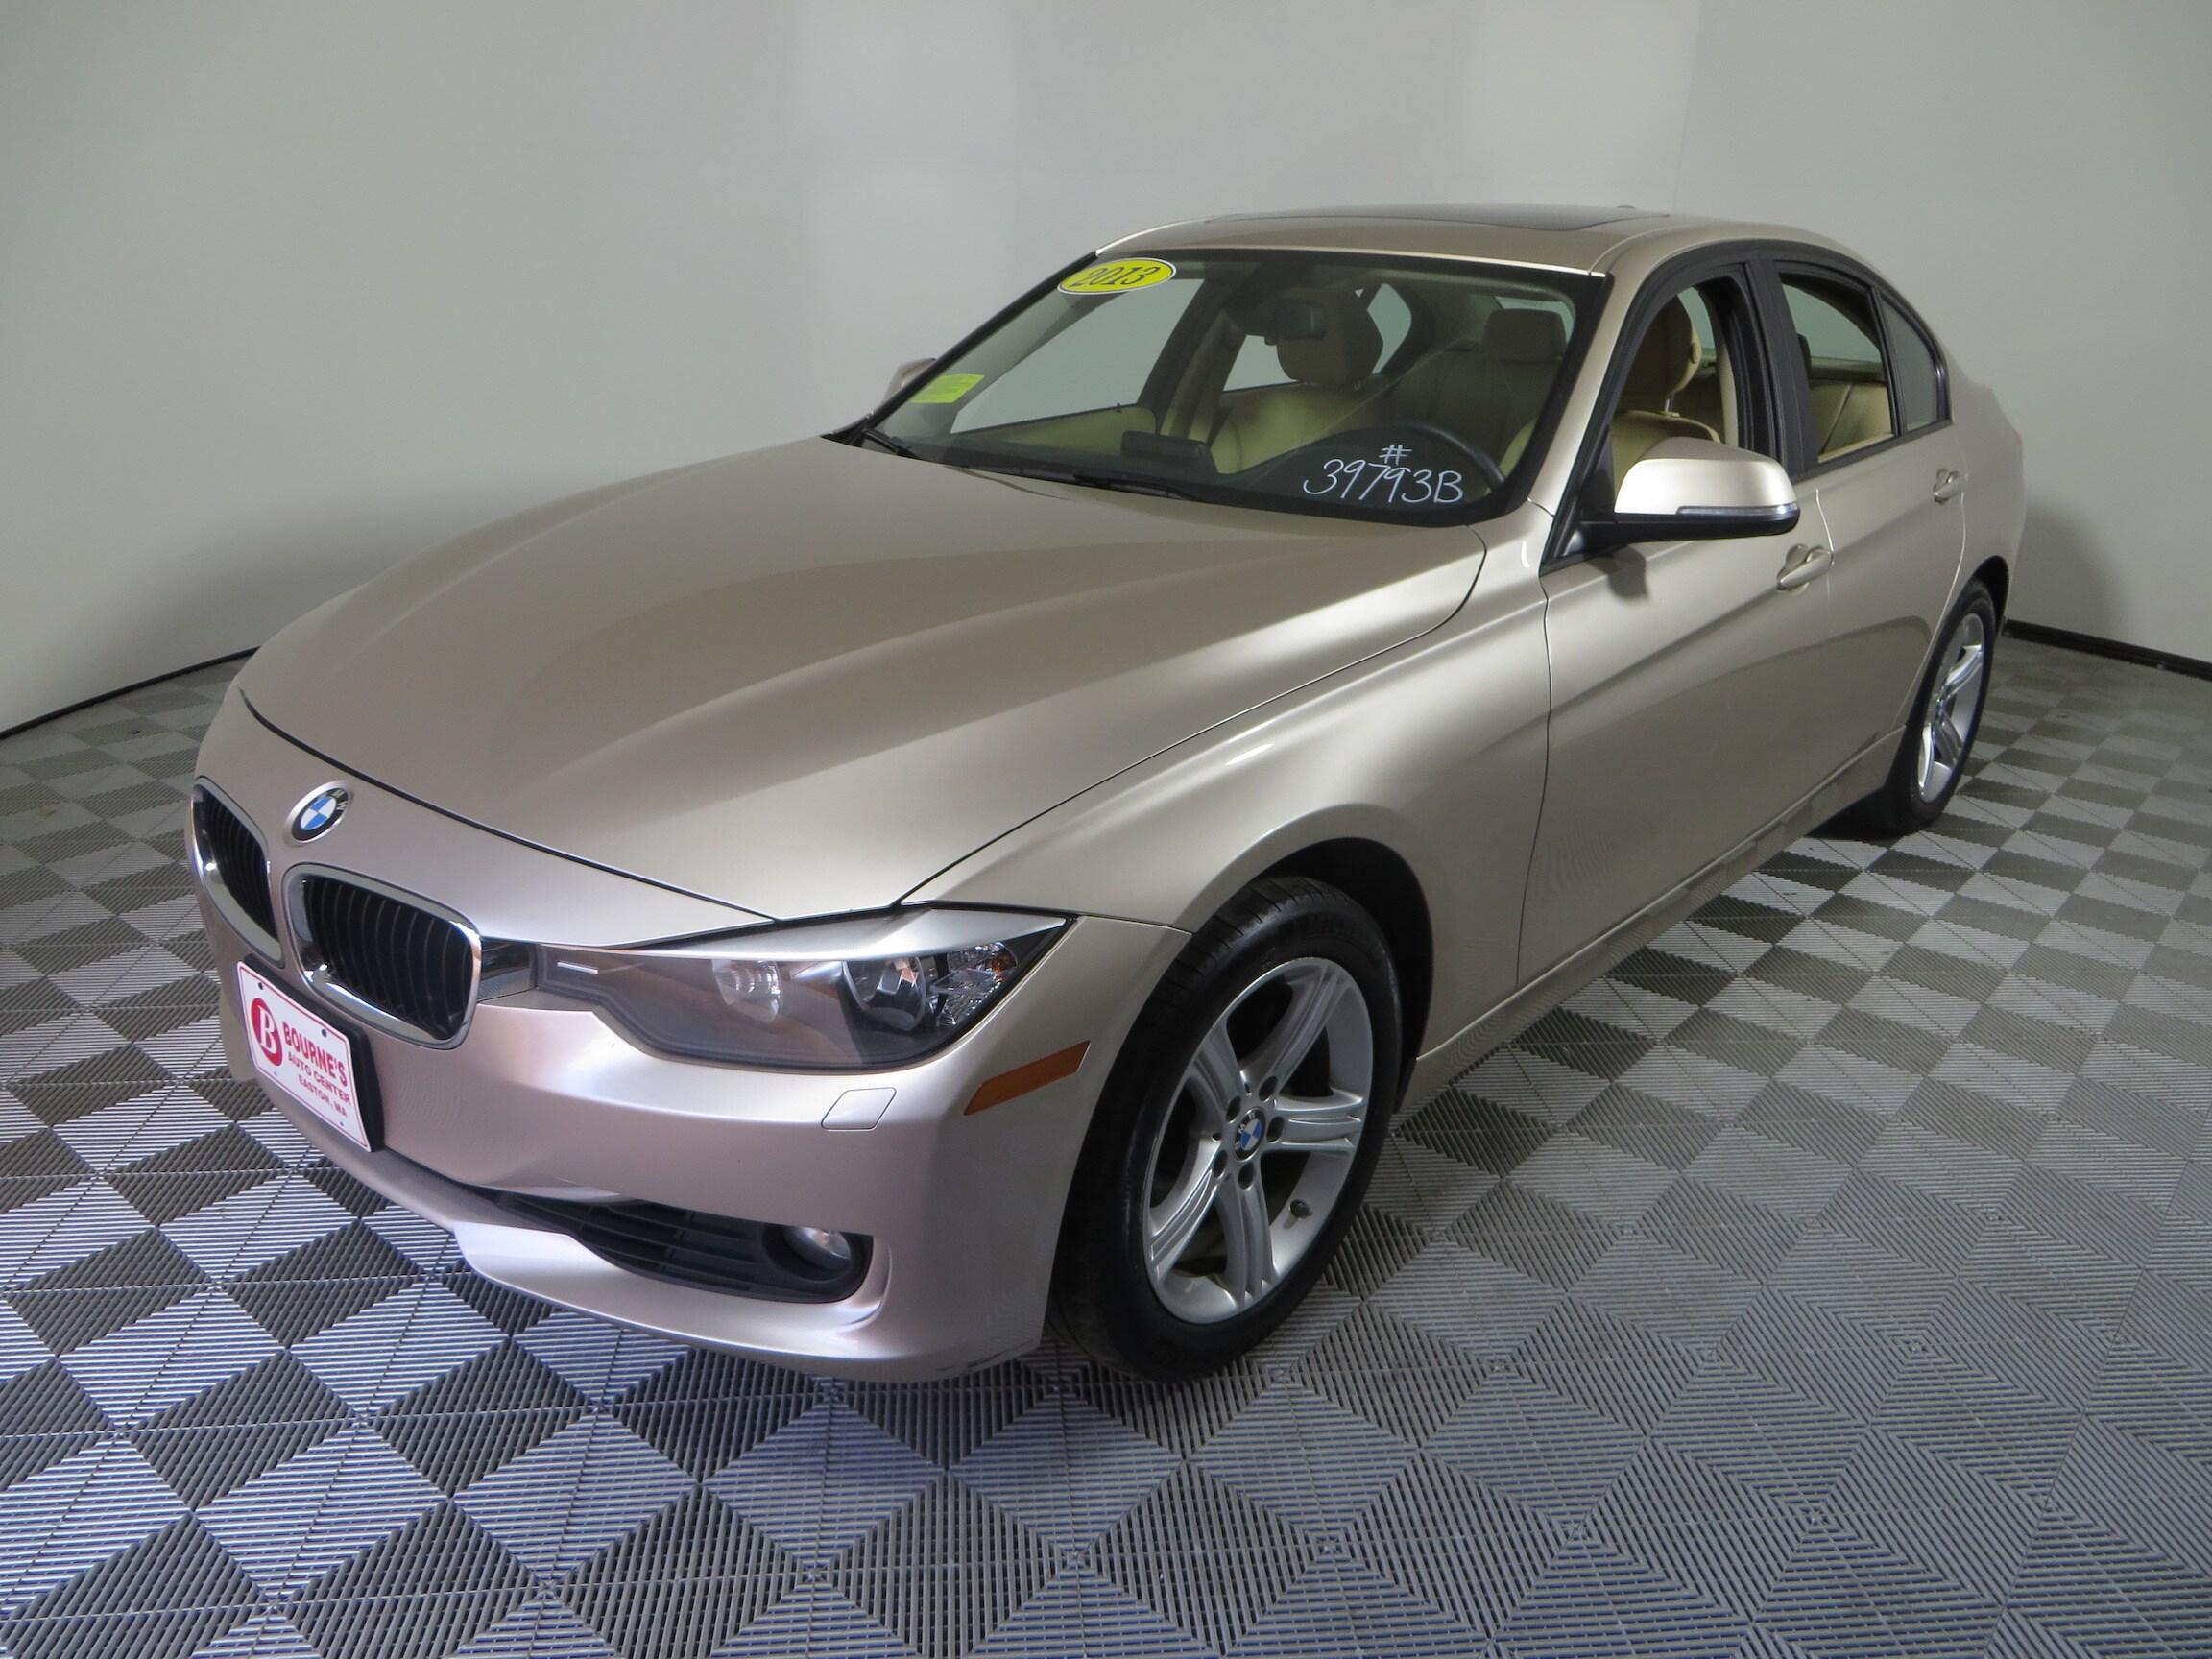 Used 2013 BMW 328, $18290